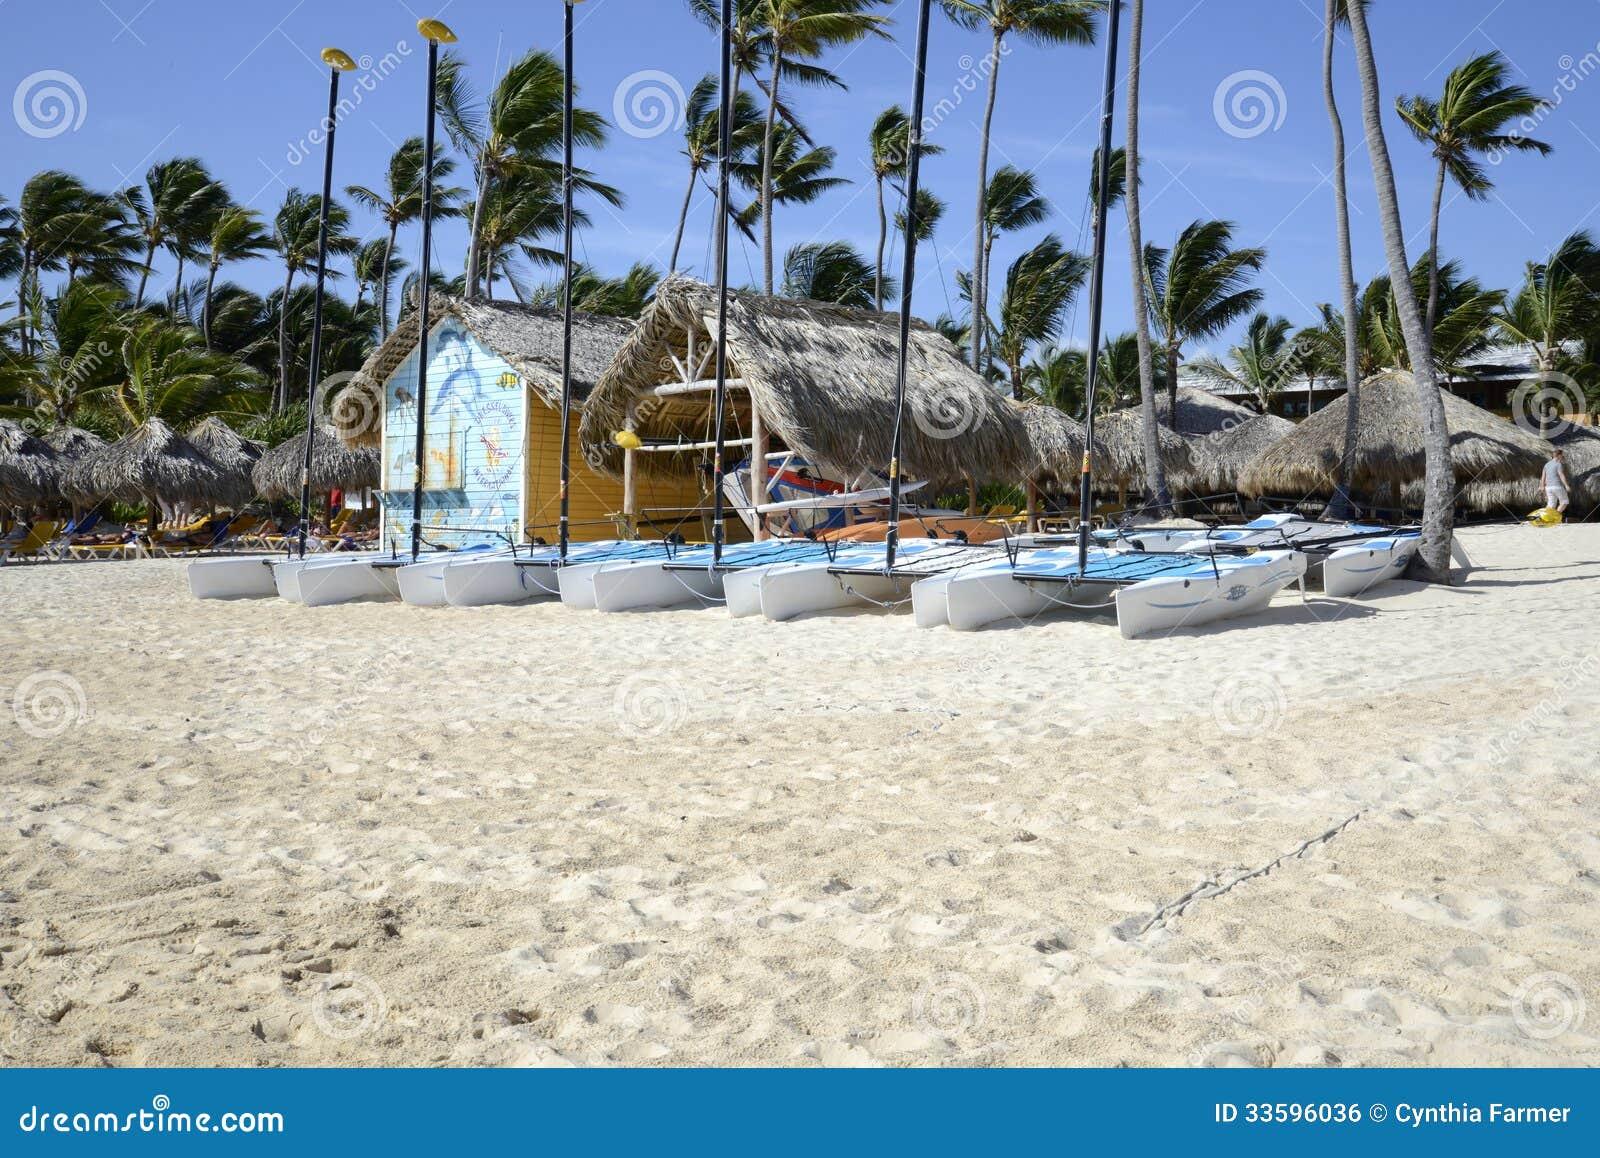 catamaran sailboats editorial photo image 33596036. Black Bedroom Furniture Sets. Home Design Ideas